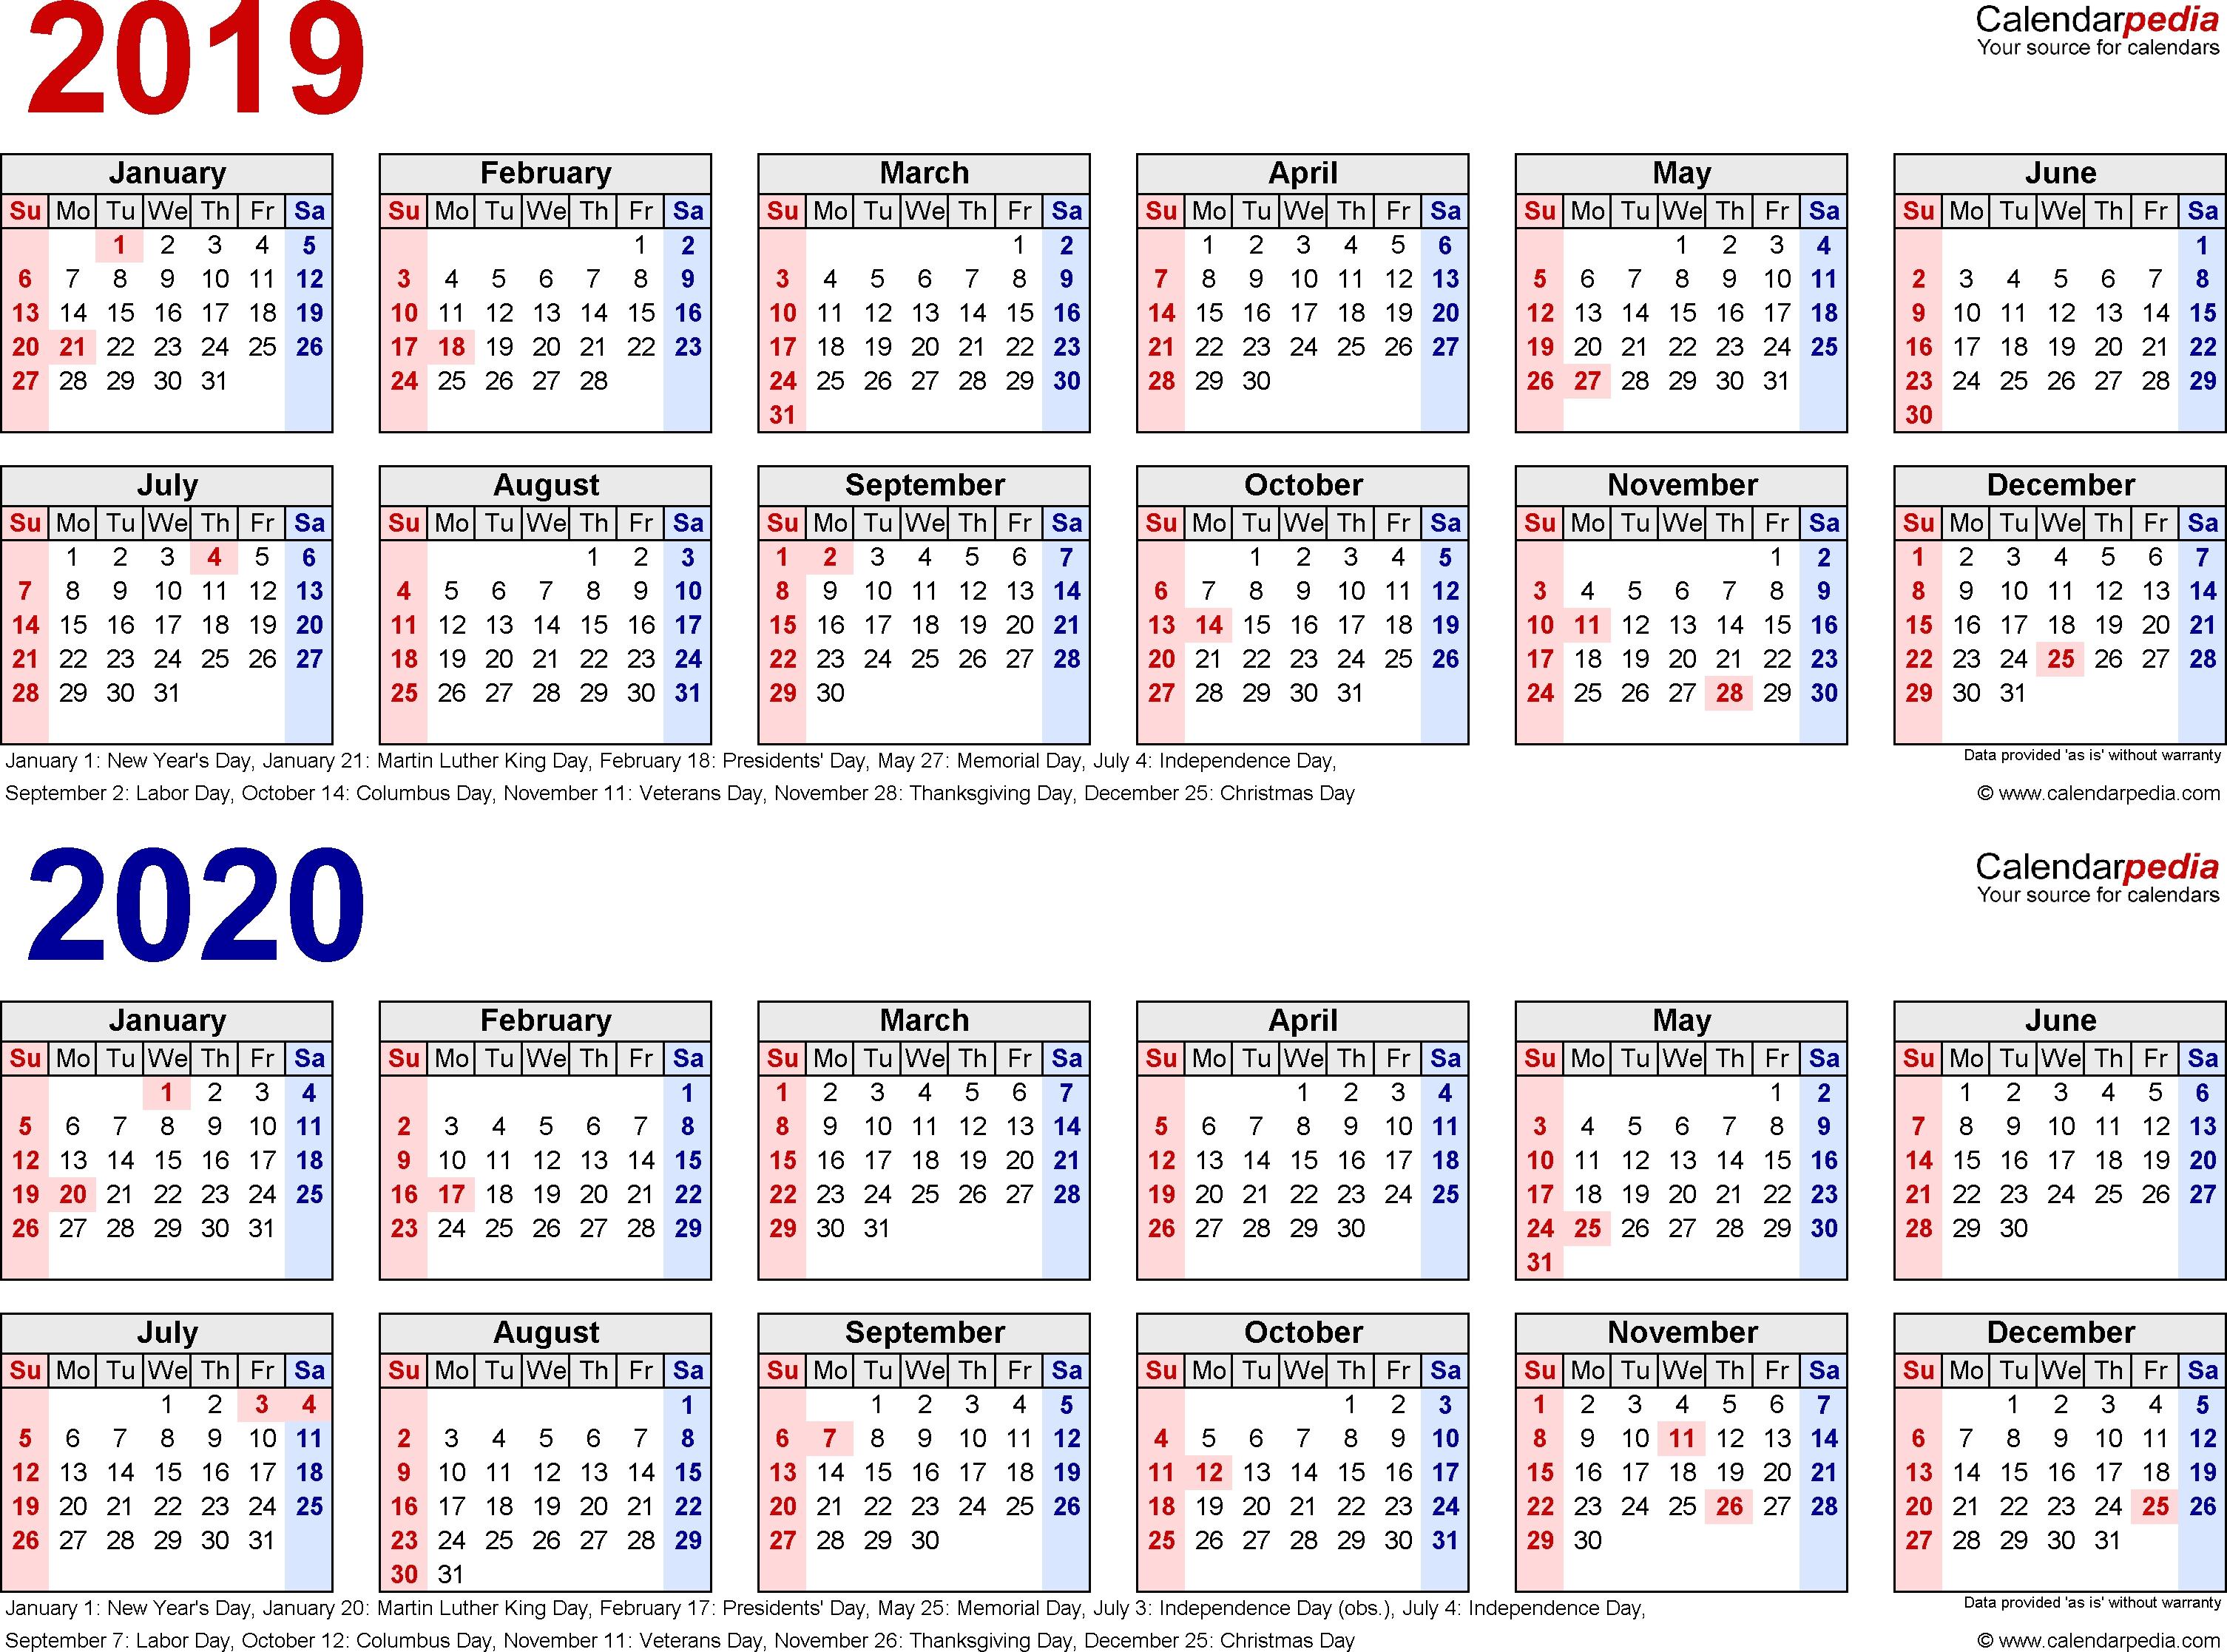 2019-2020 Calendar - Free Printable Two-Year Word Calendars throughout Printable Calendars July 2019 To June 2020